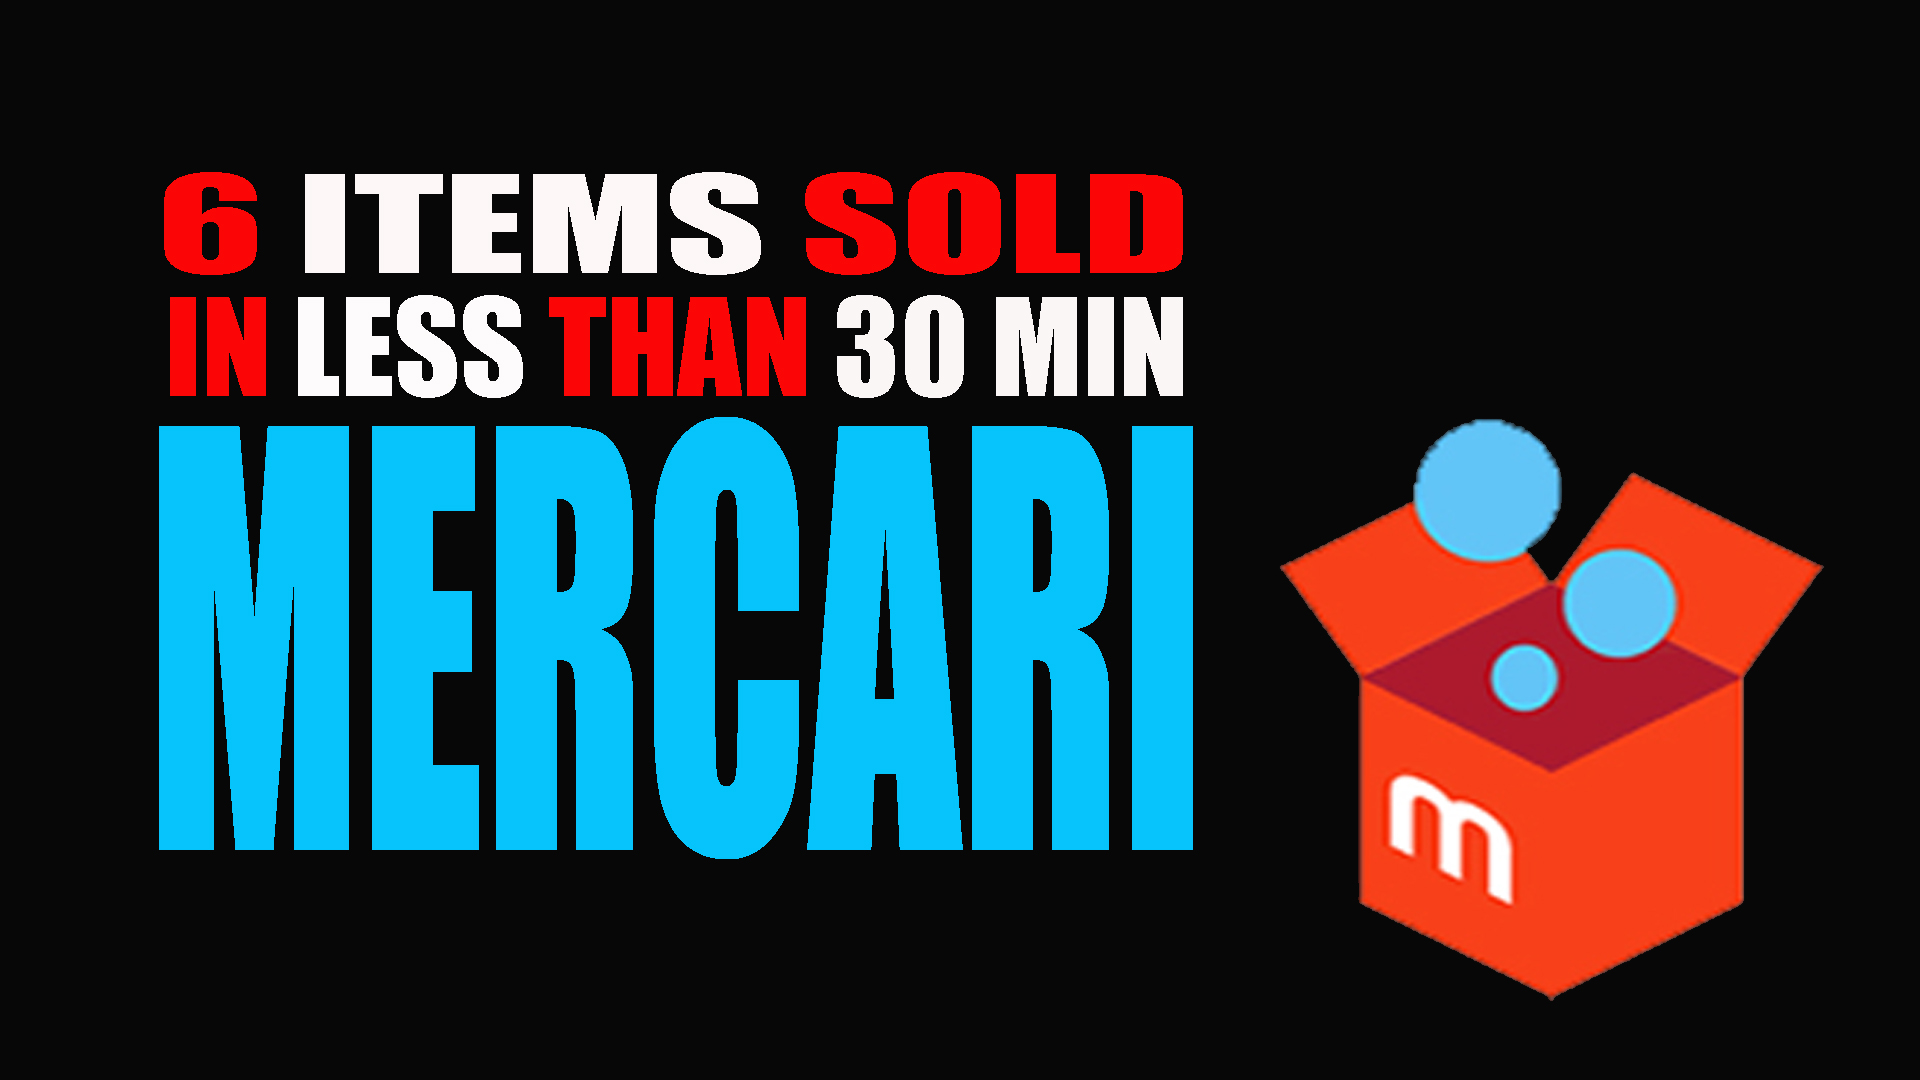 sold in less than 30 min on mercari